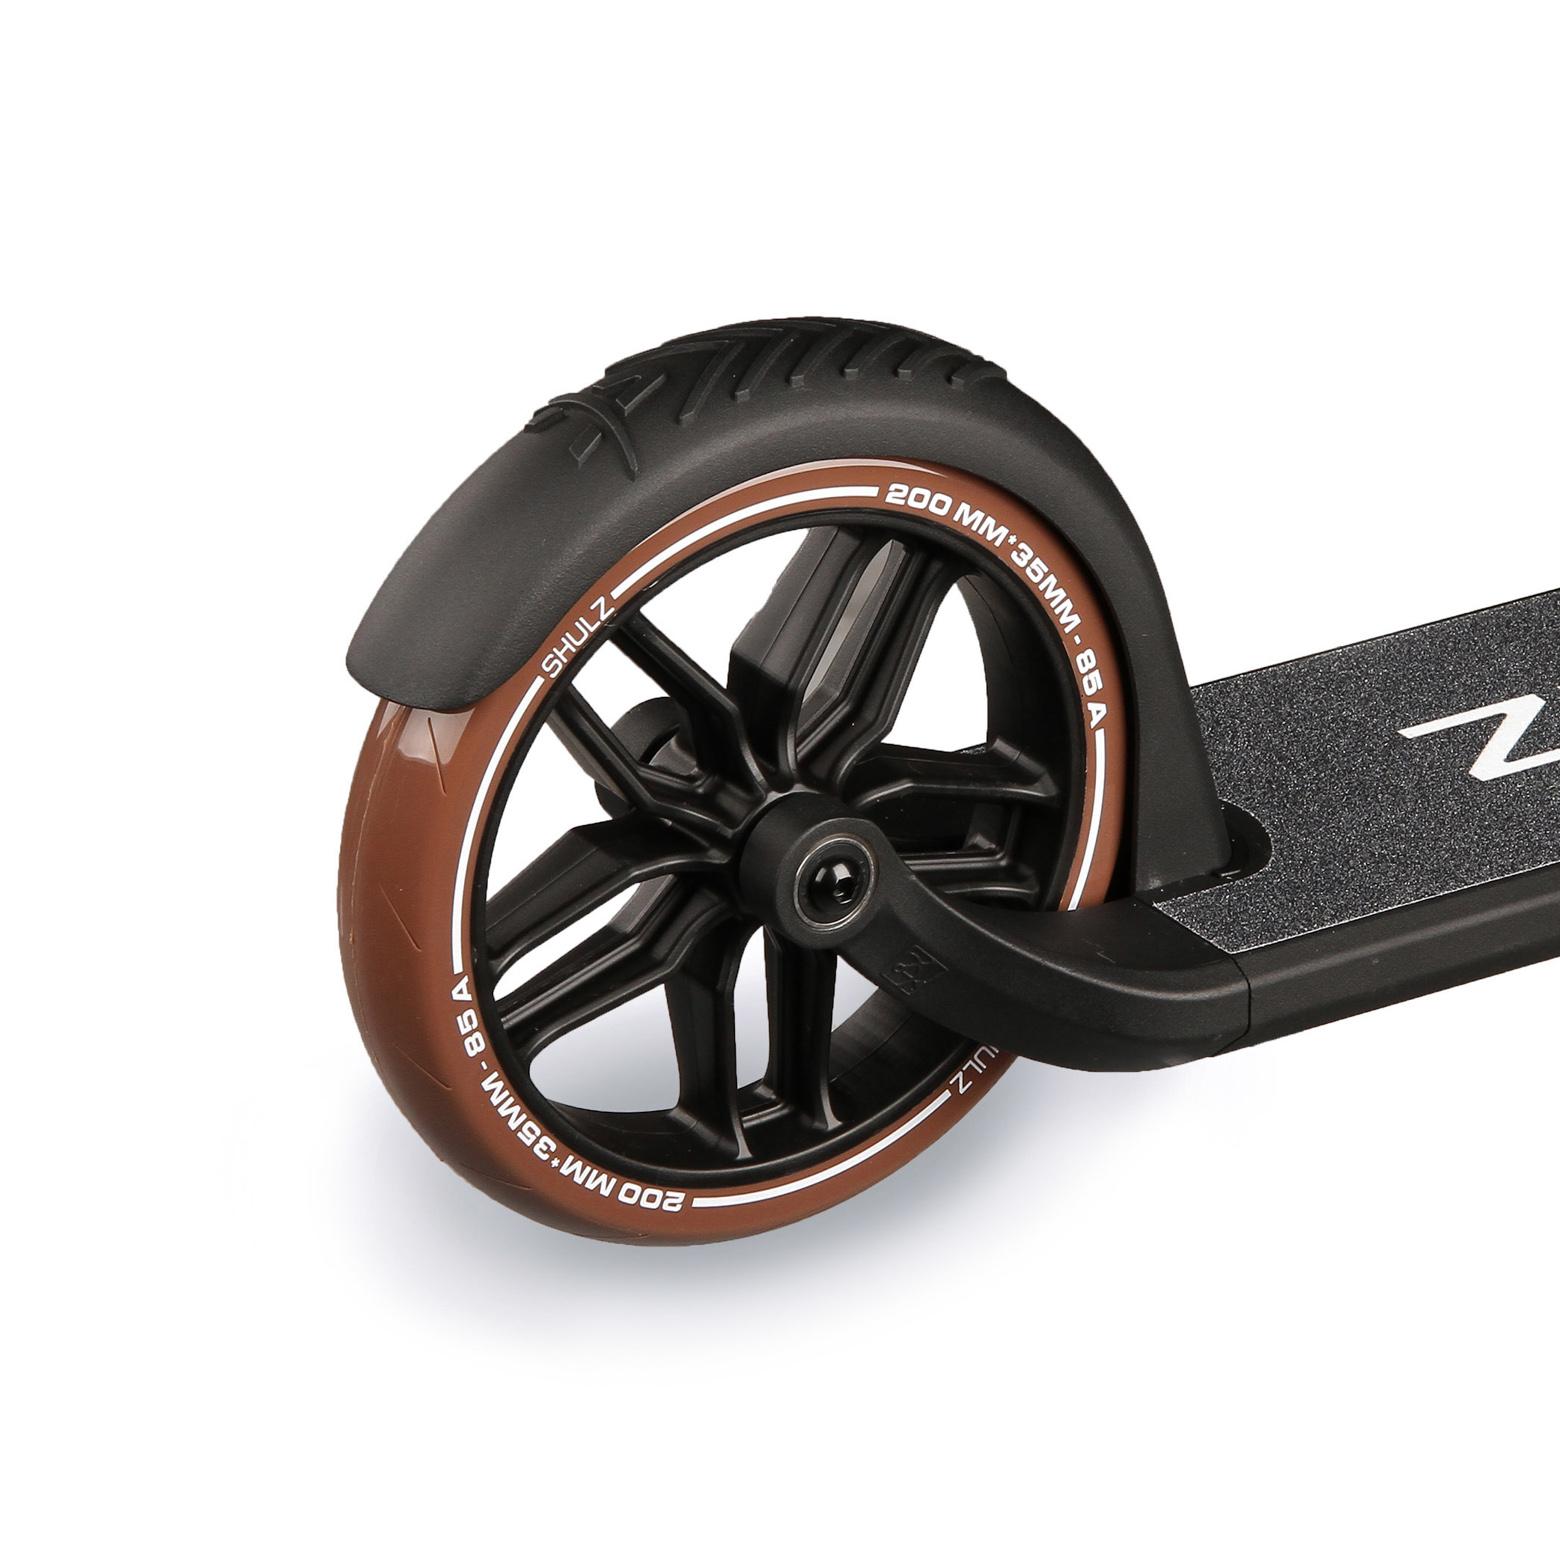 Shulz 200pro Чёрный